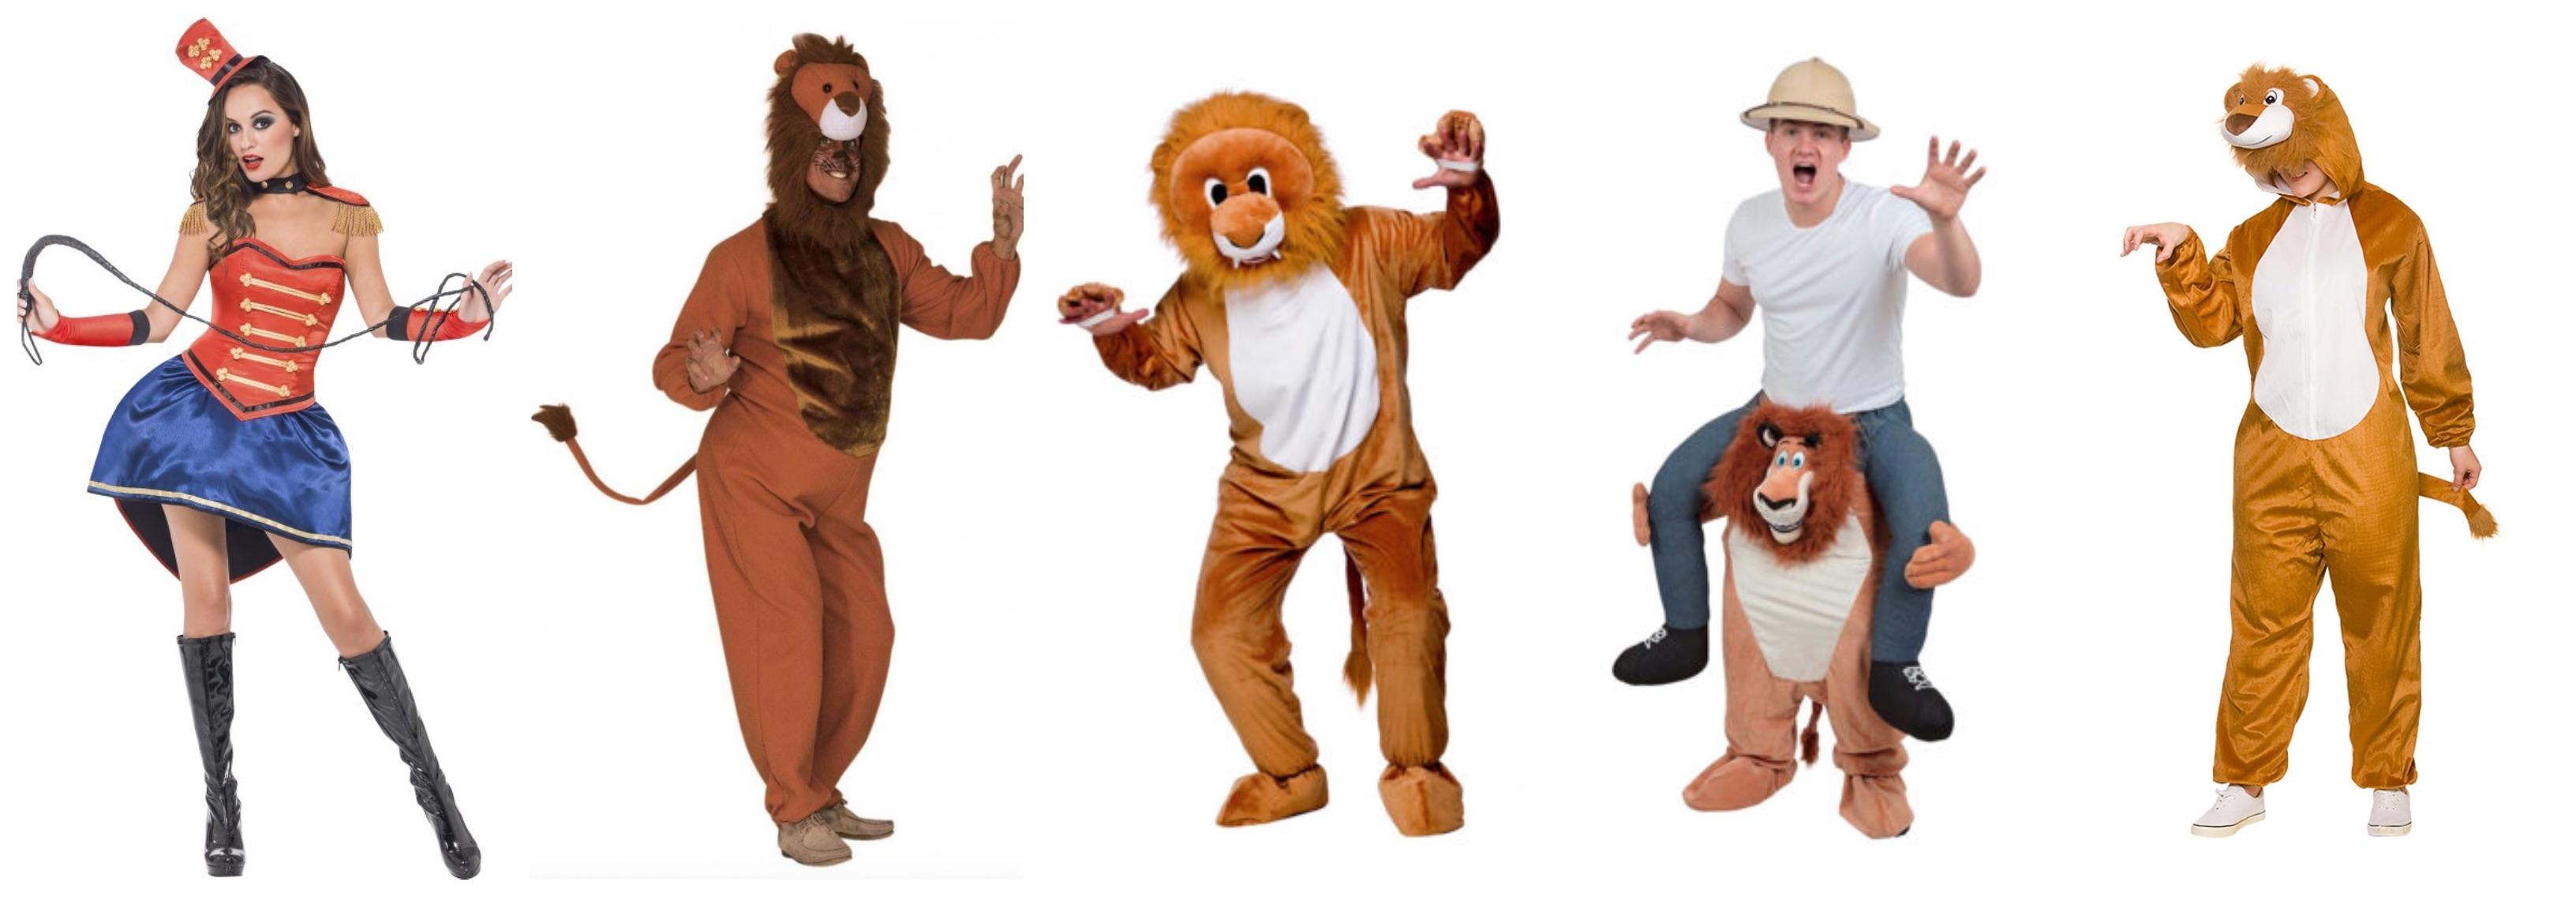 løve kostume til voksne 1 - Løve kostume til voksne